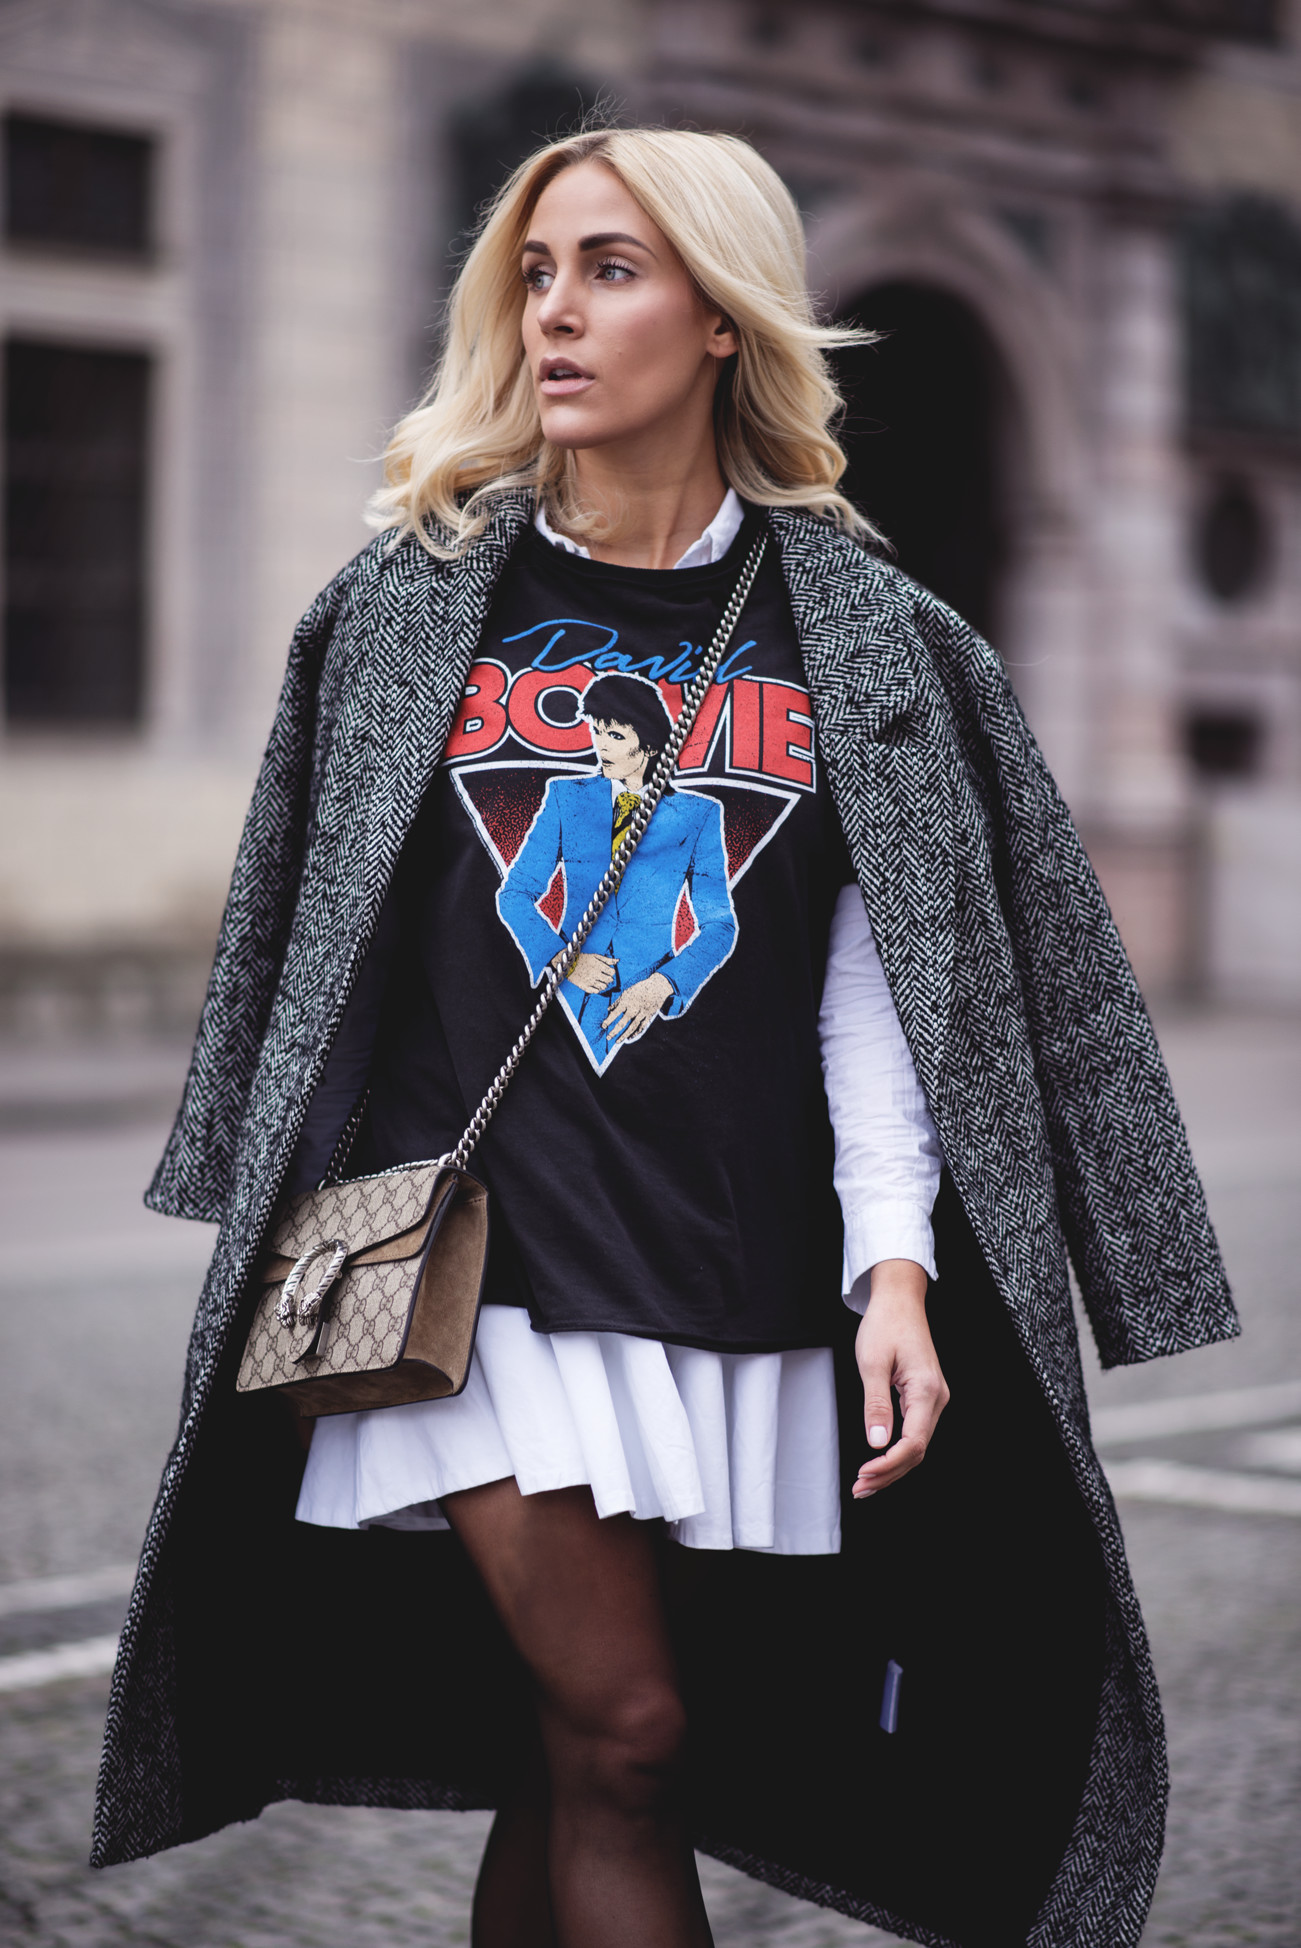 davidbowie-bandshirt-guccidionysus-fashion-fashionblogger-munich-sequinsophia-3-dsc_3739